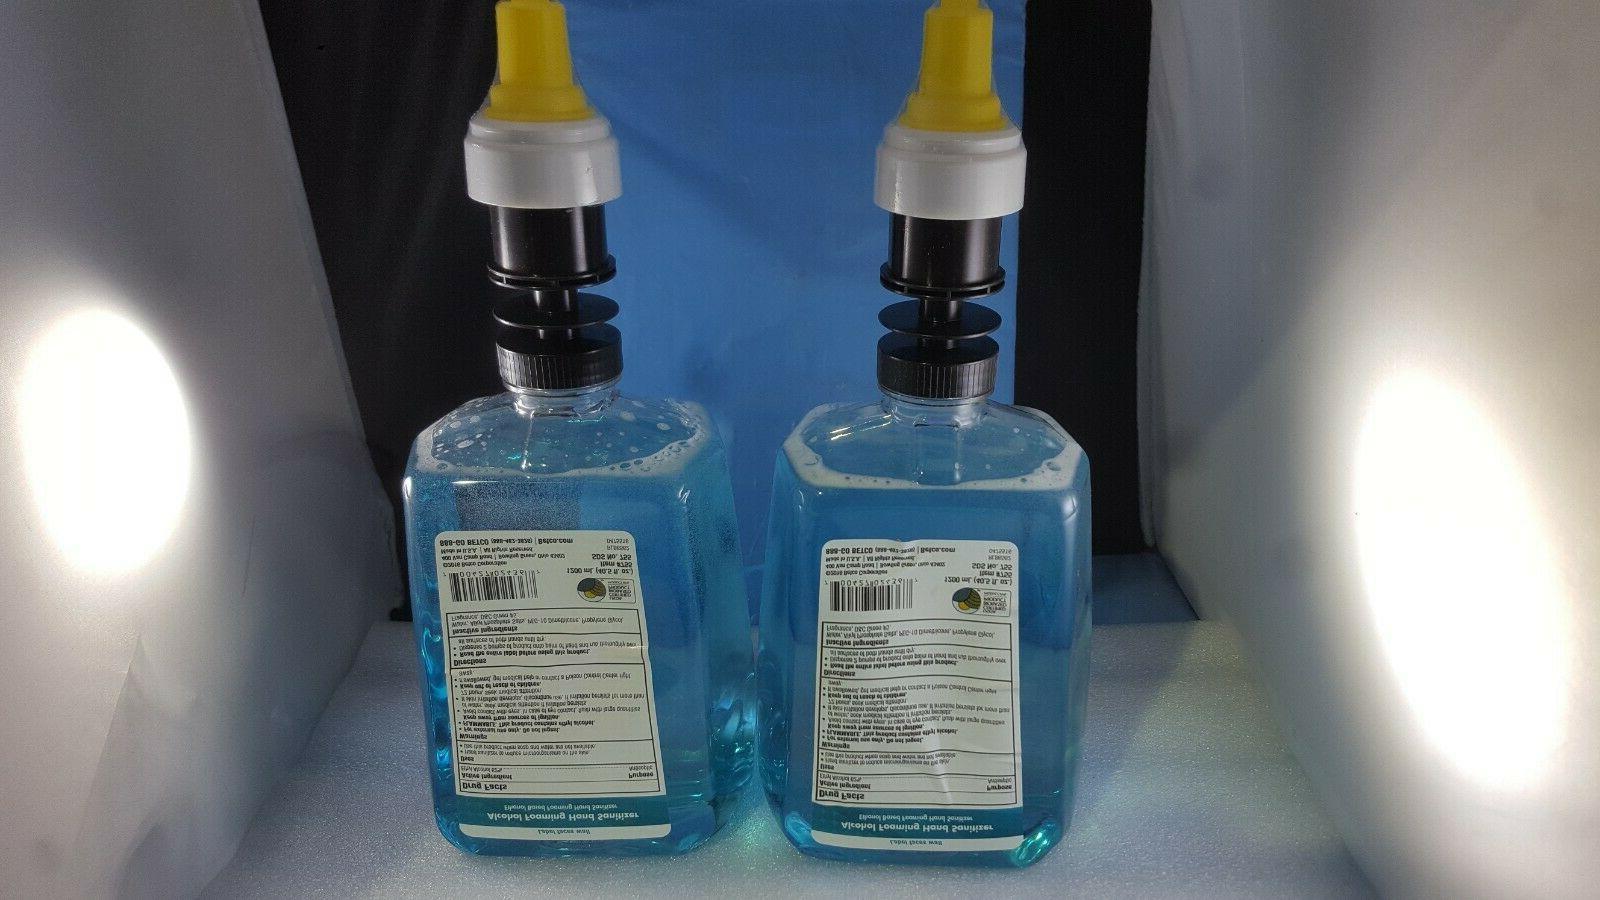 CASE OF Sanitizer Foaming ,